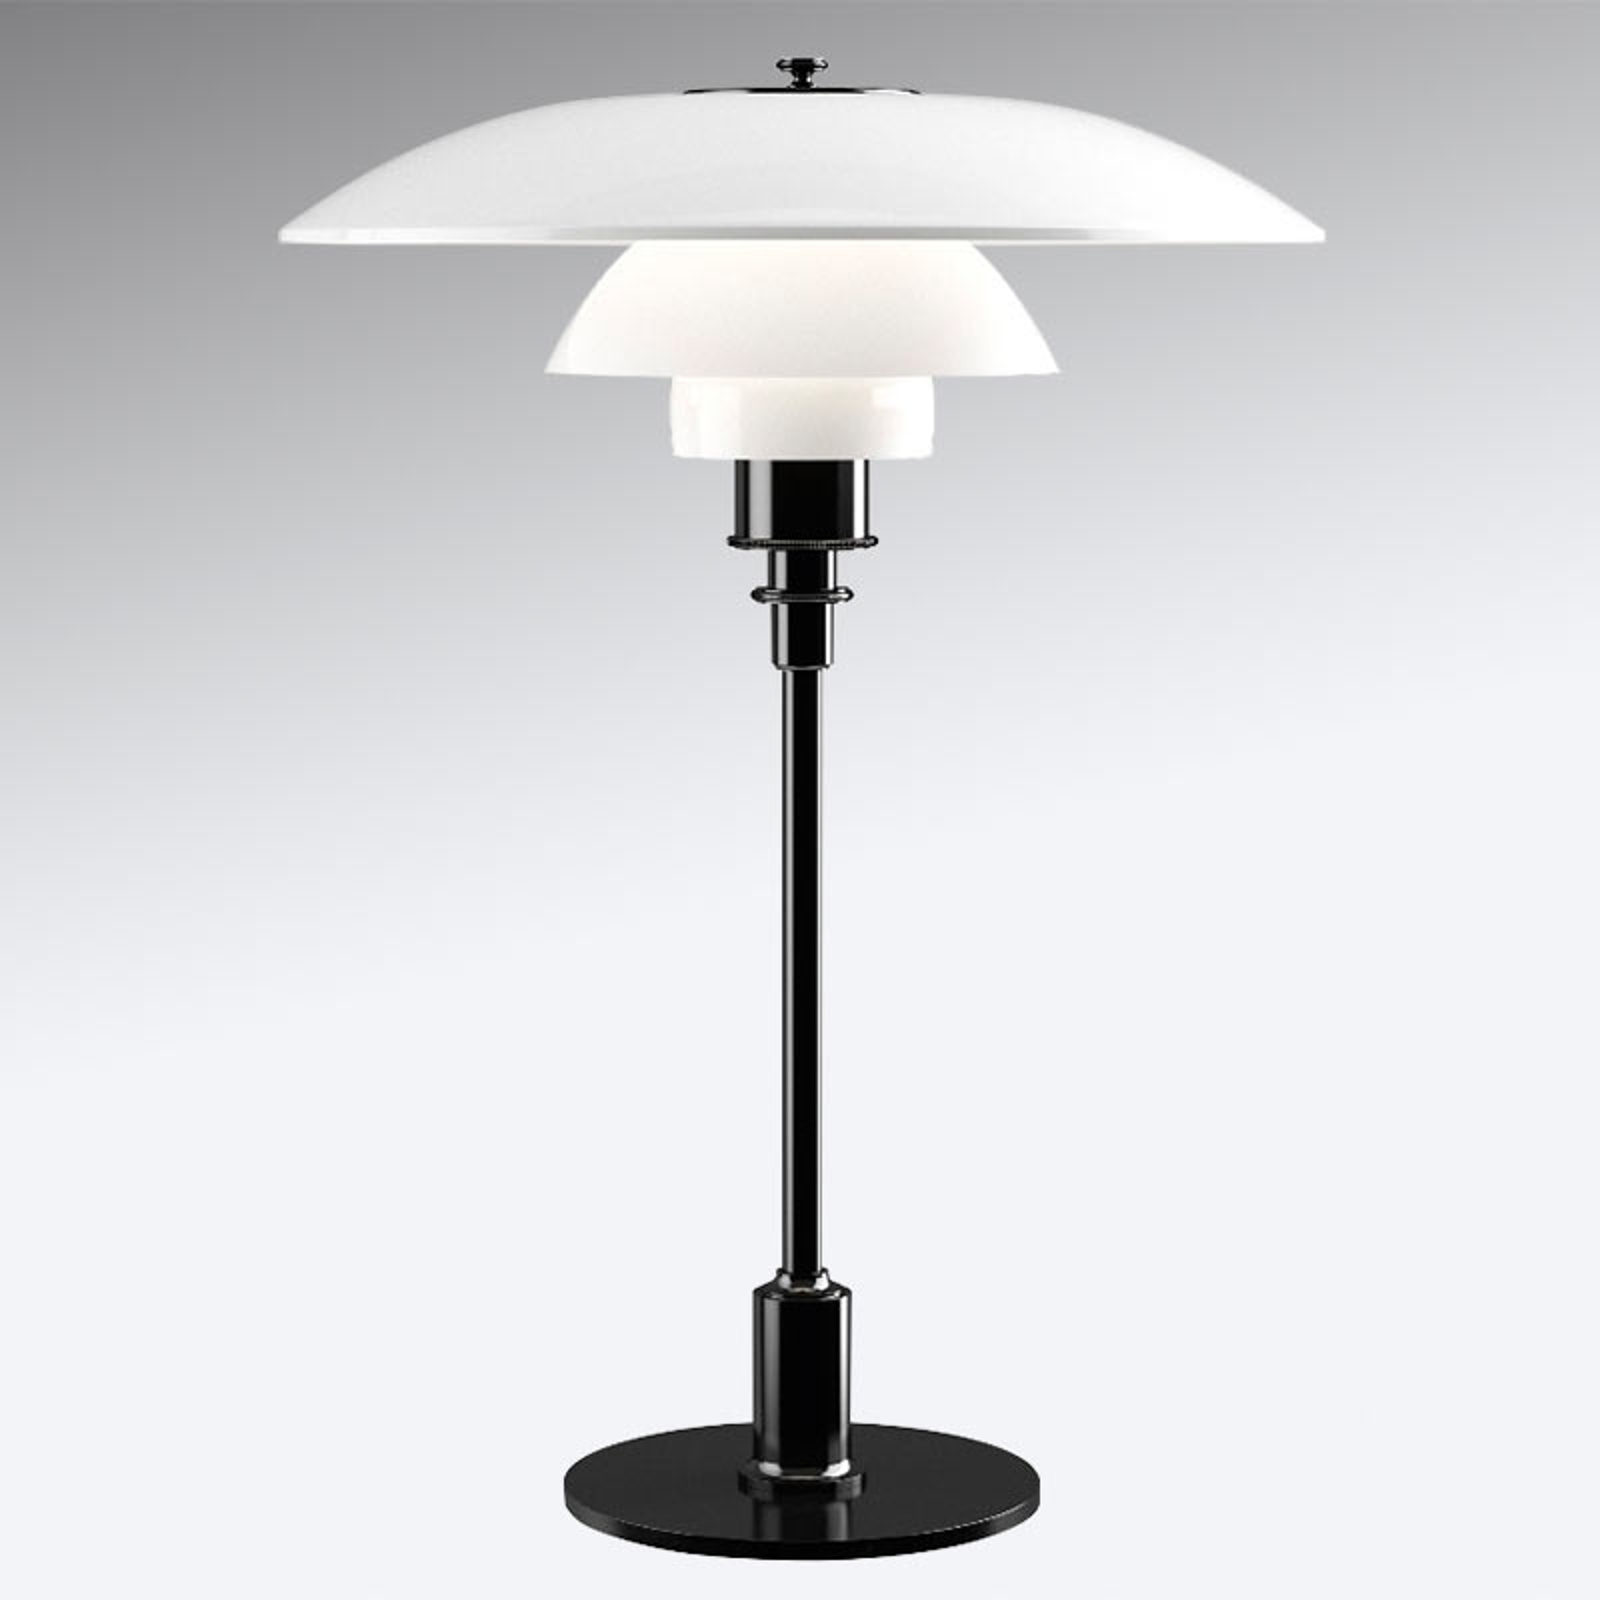 Tafellamp PH 3 1/2-2 1/2 - voet zw. gemetalliseerd